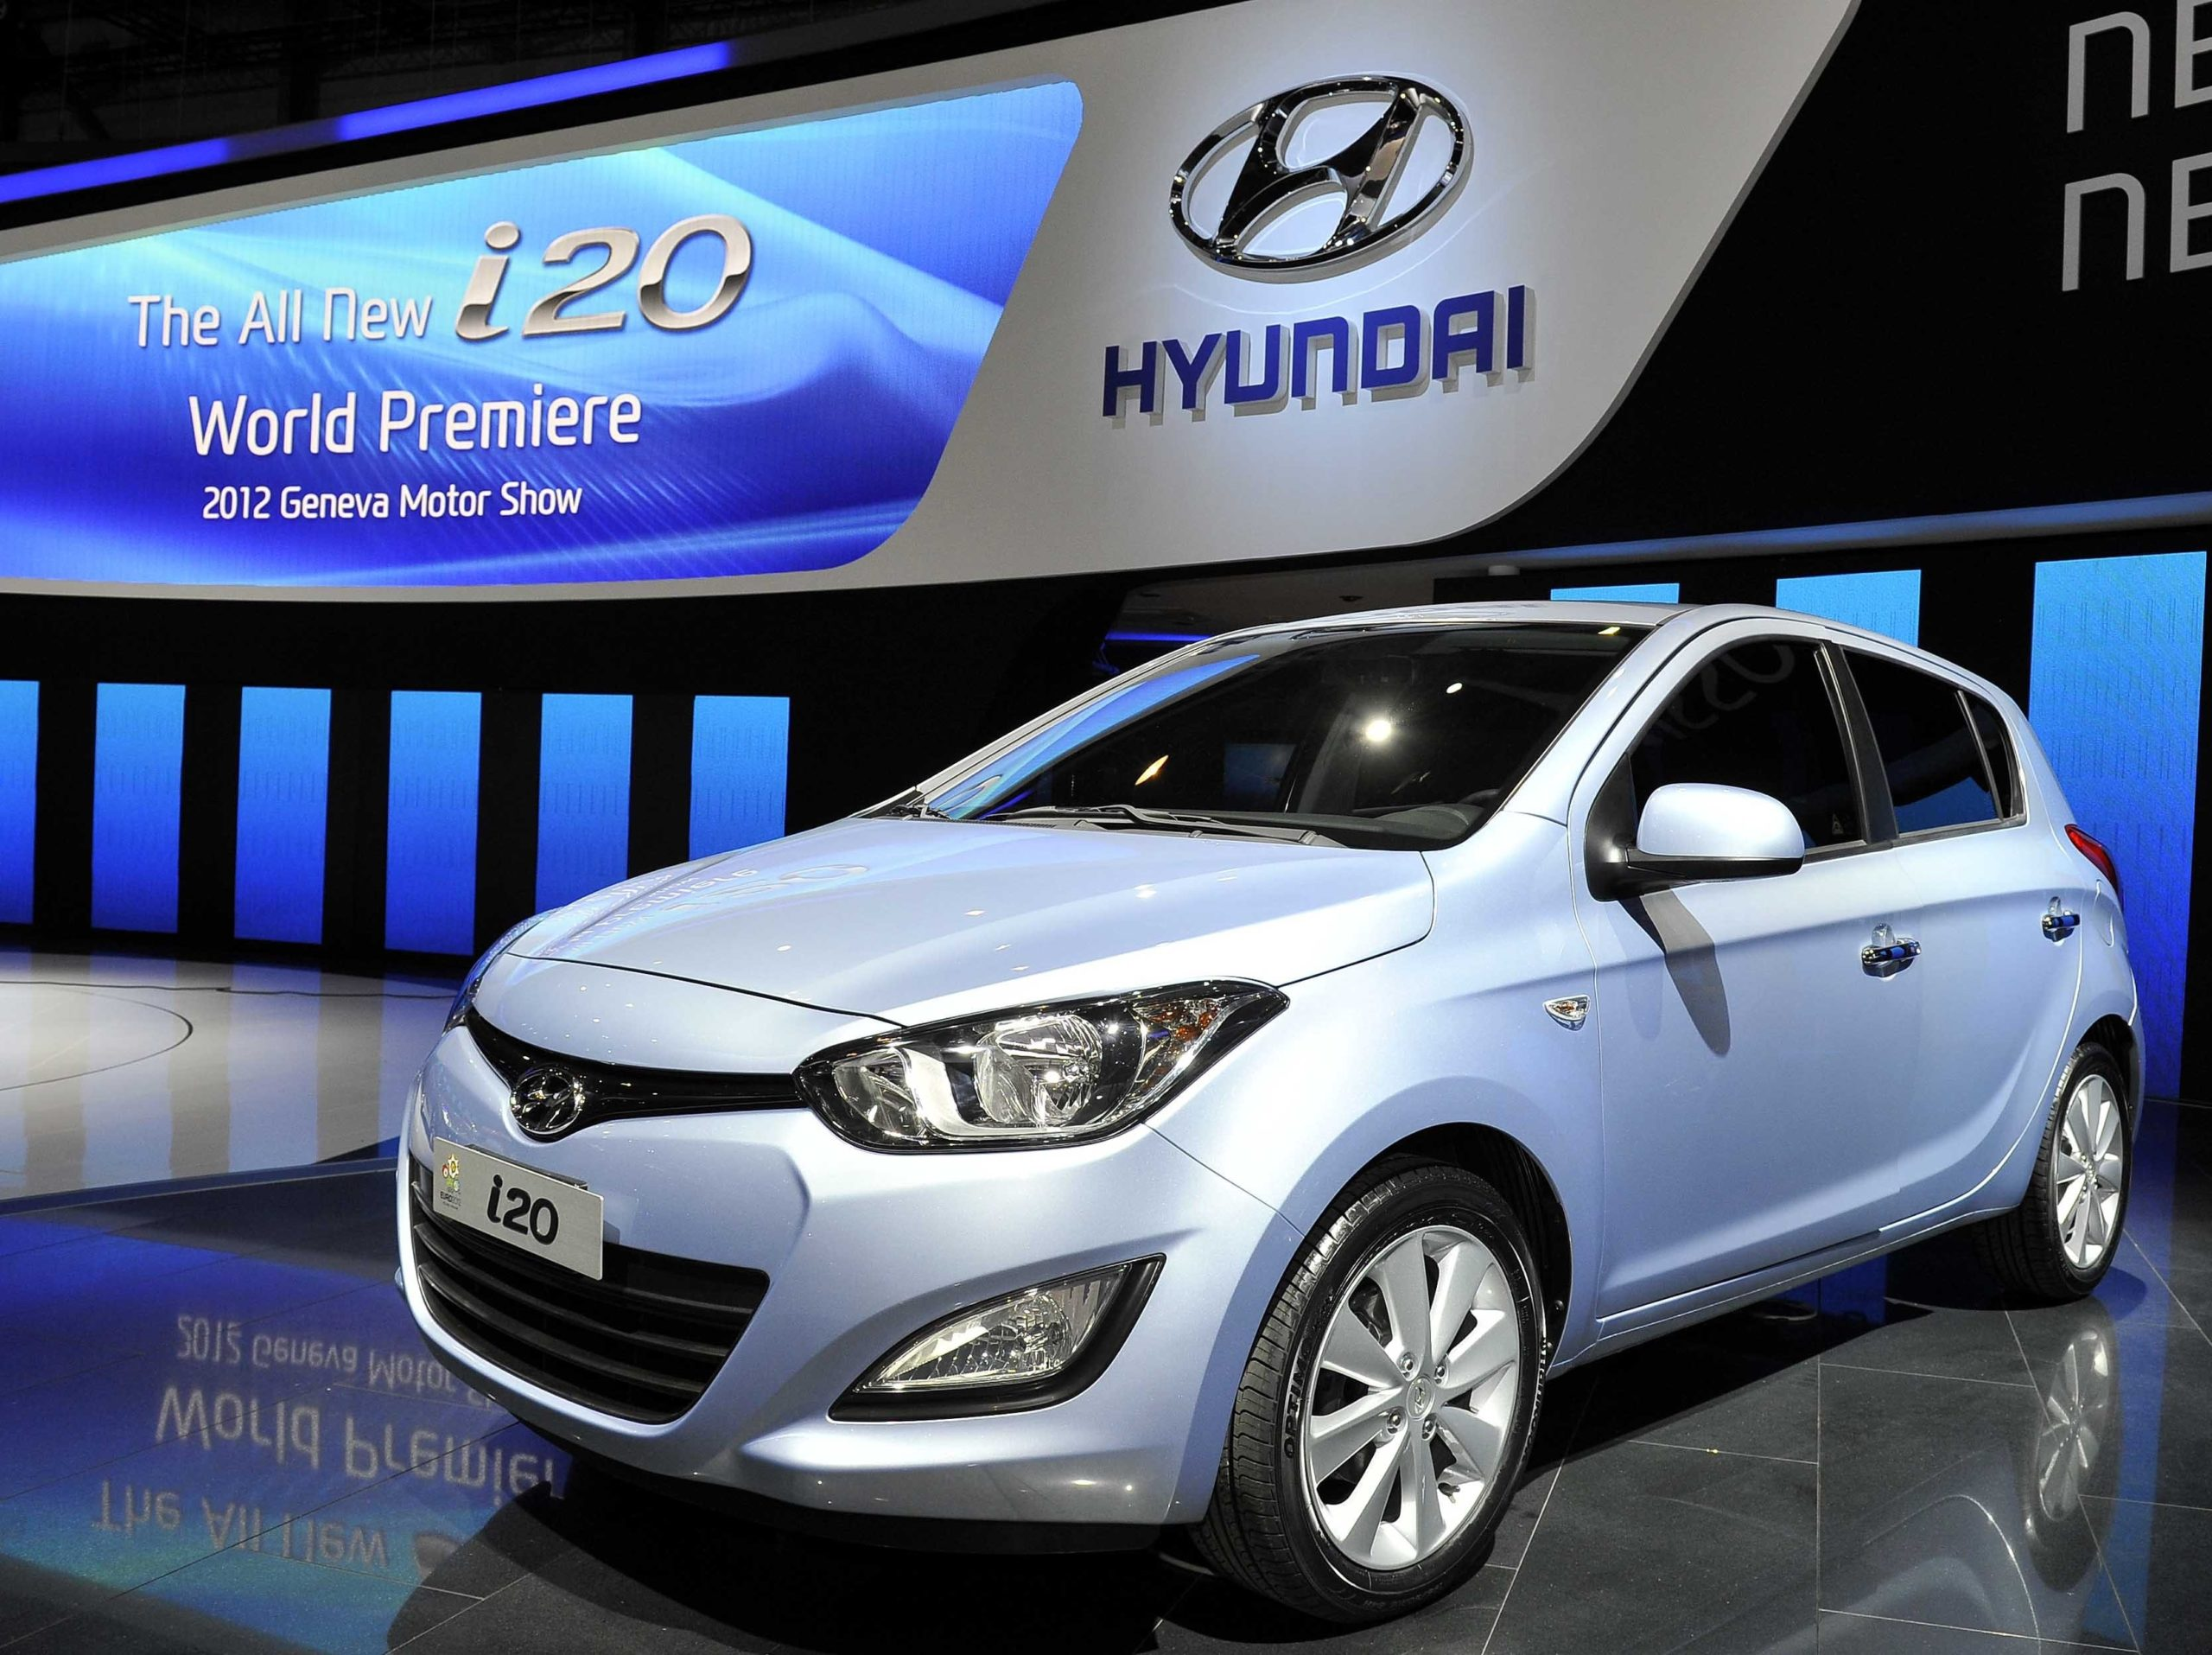 How Hyundai Motor, once a rising star, lost its shine